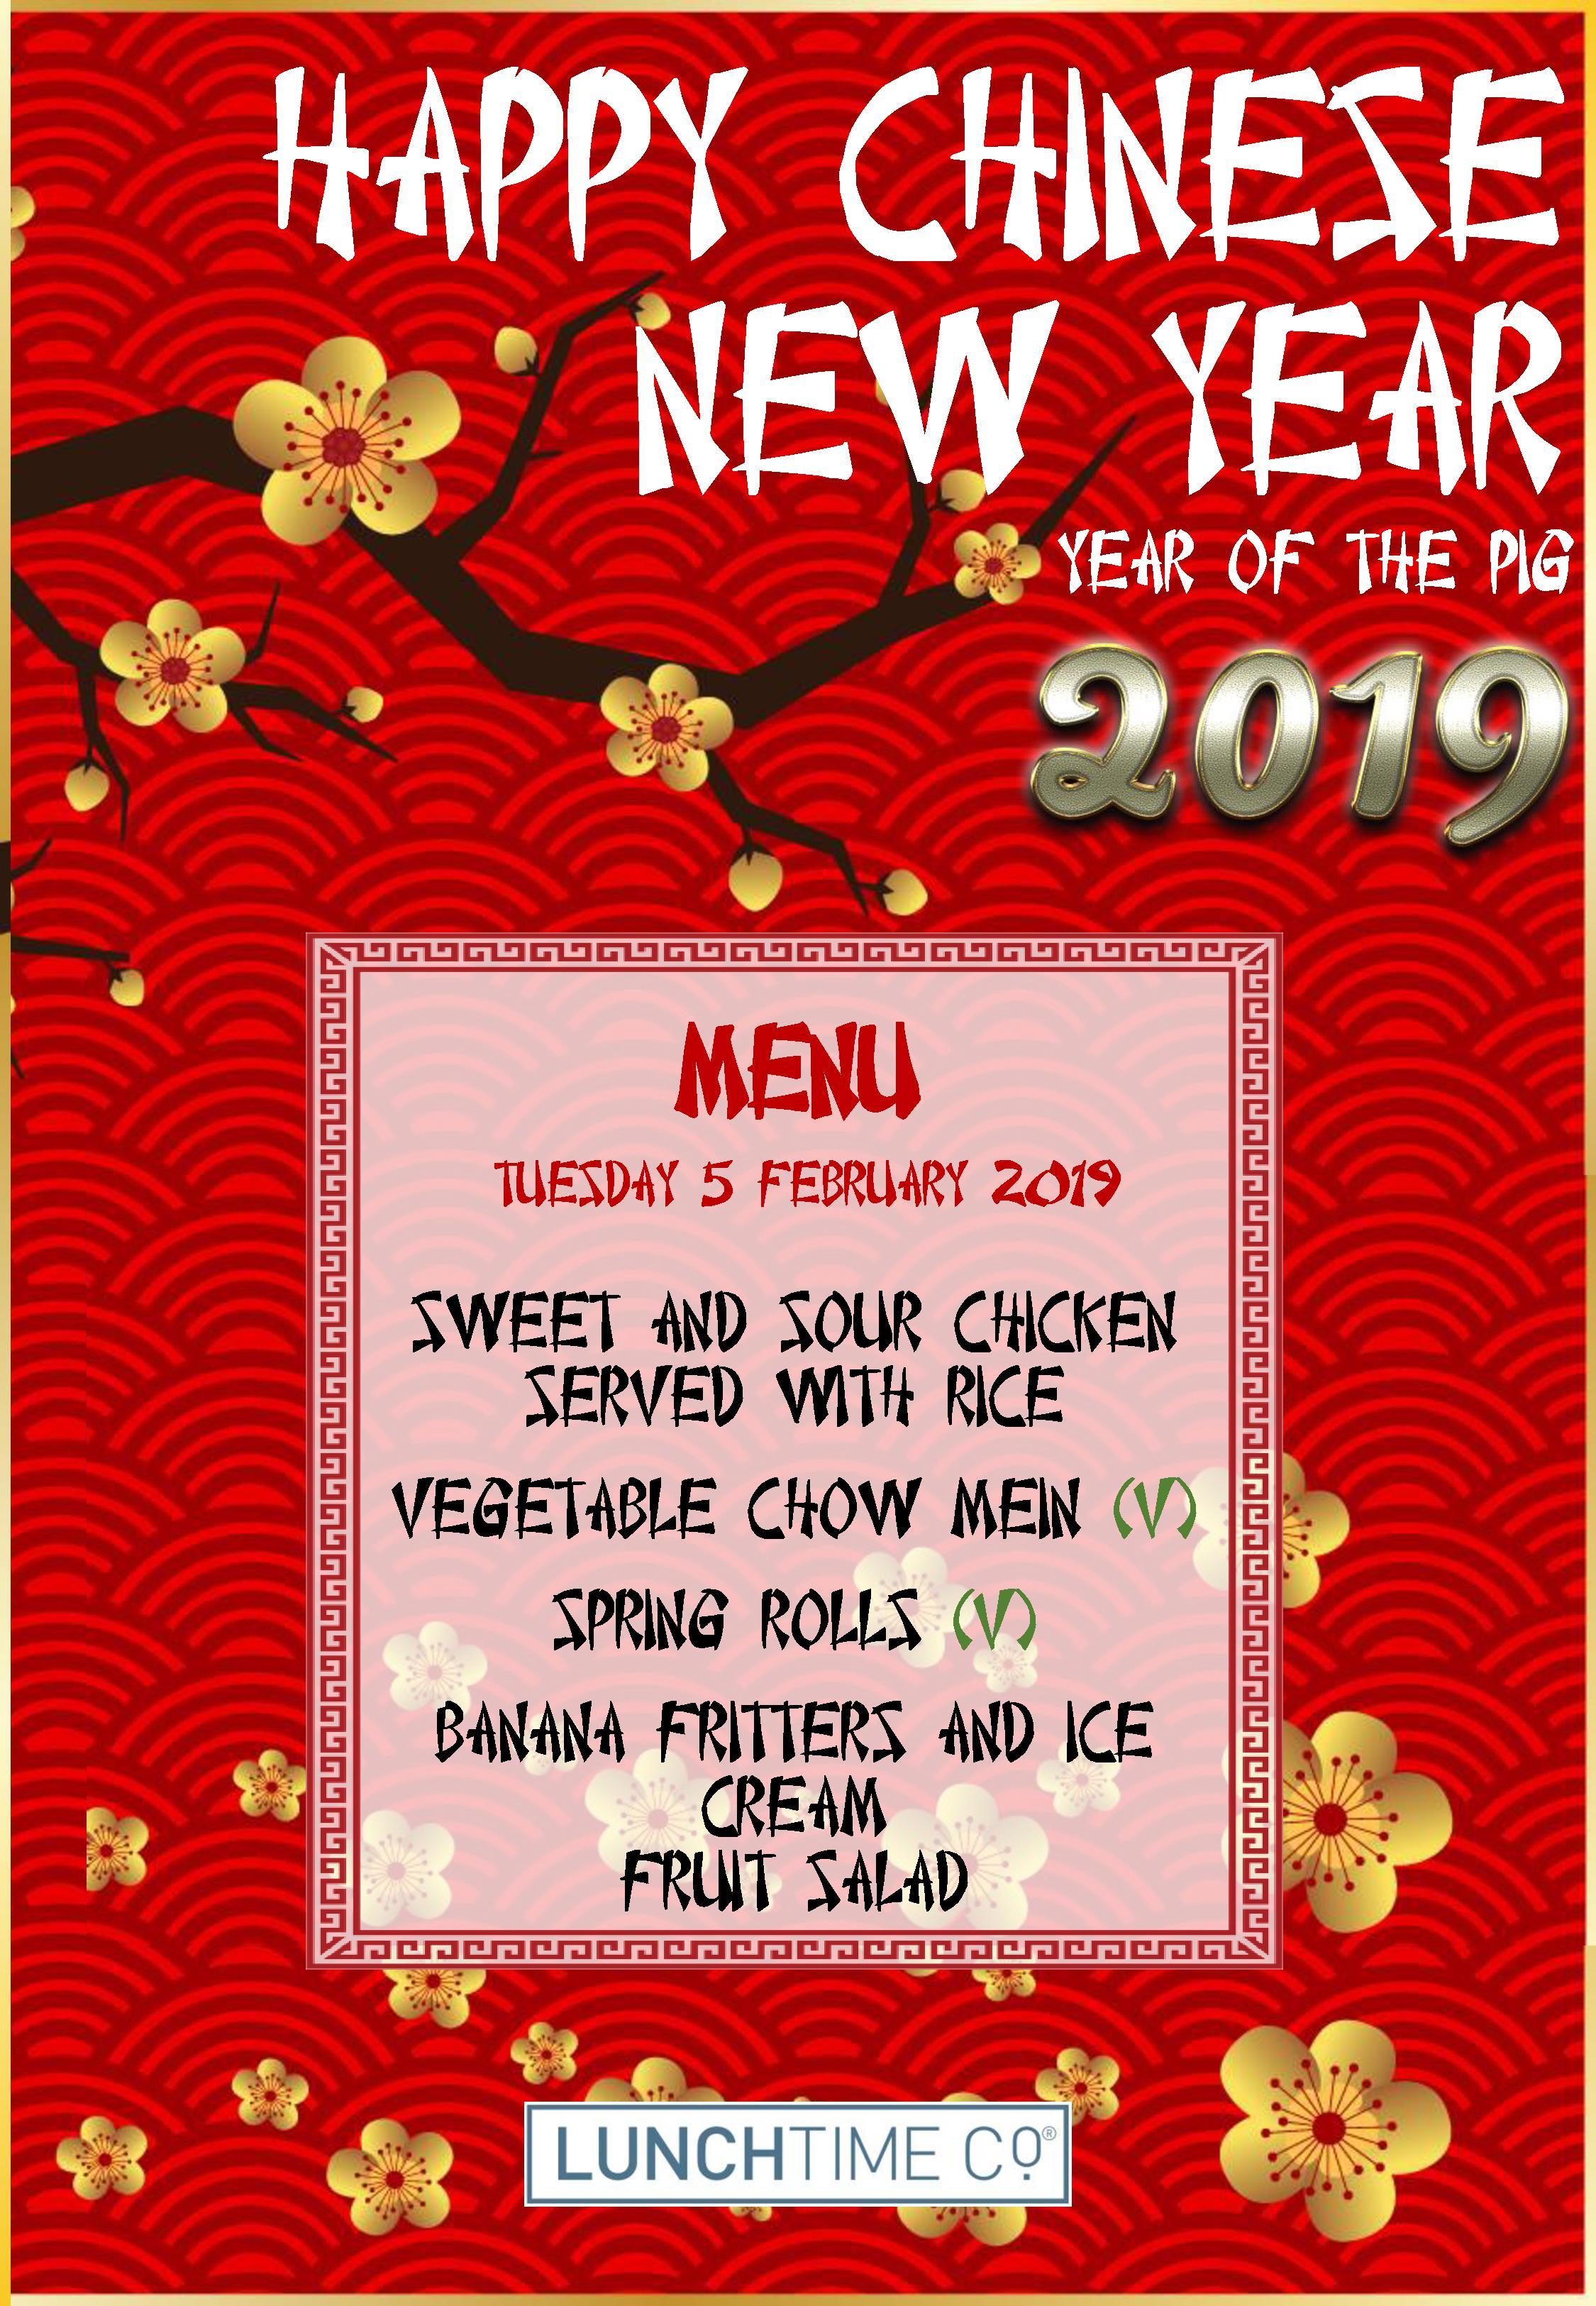 Chinese new year 050219 - Earlsmead.jpg